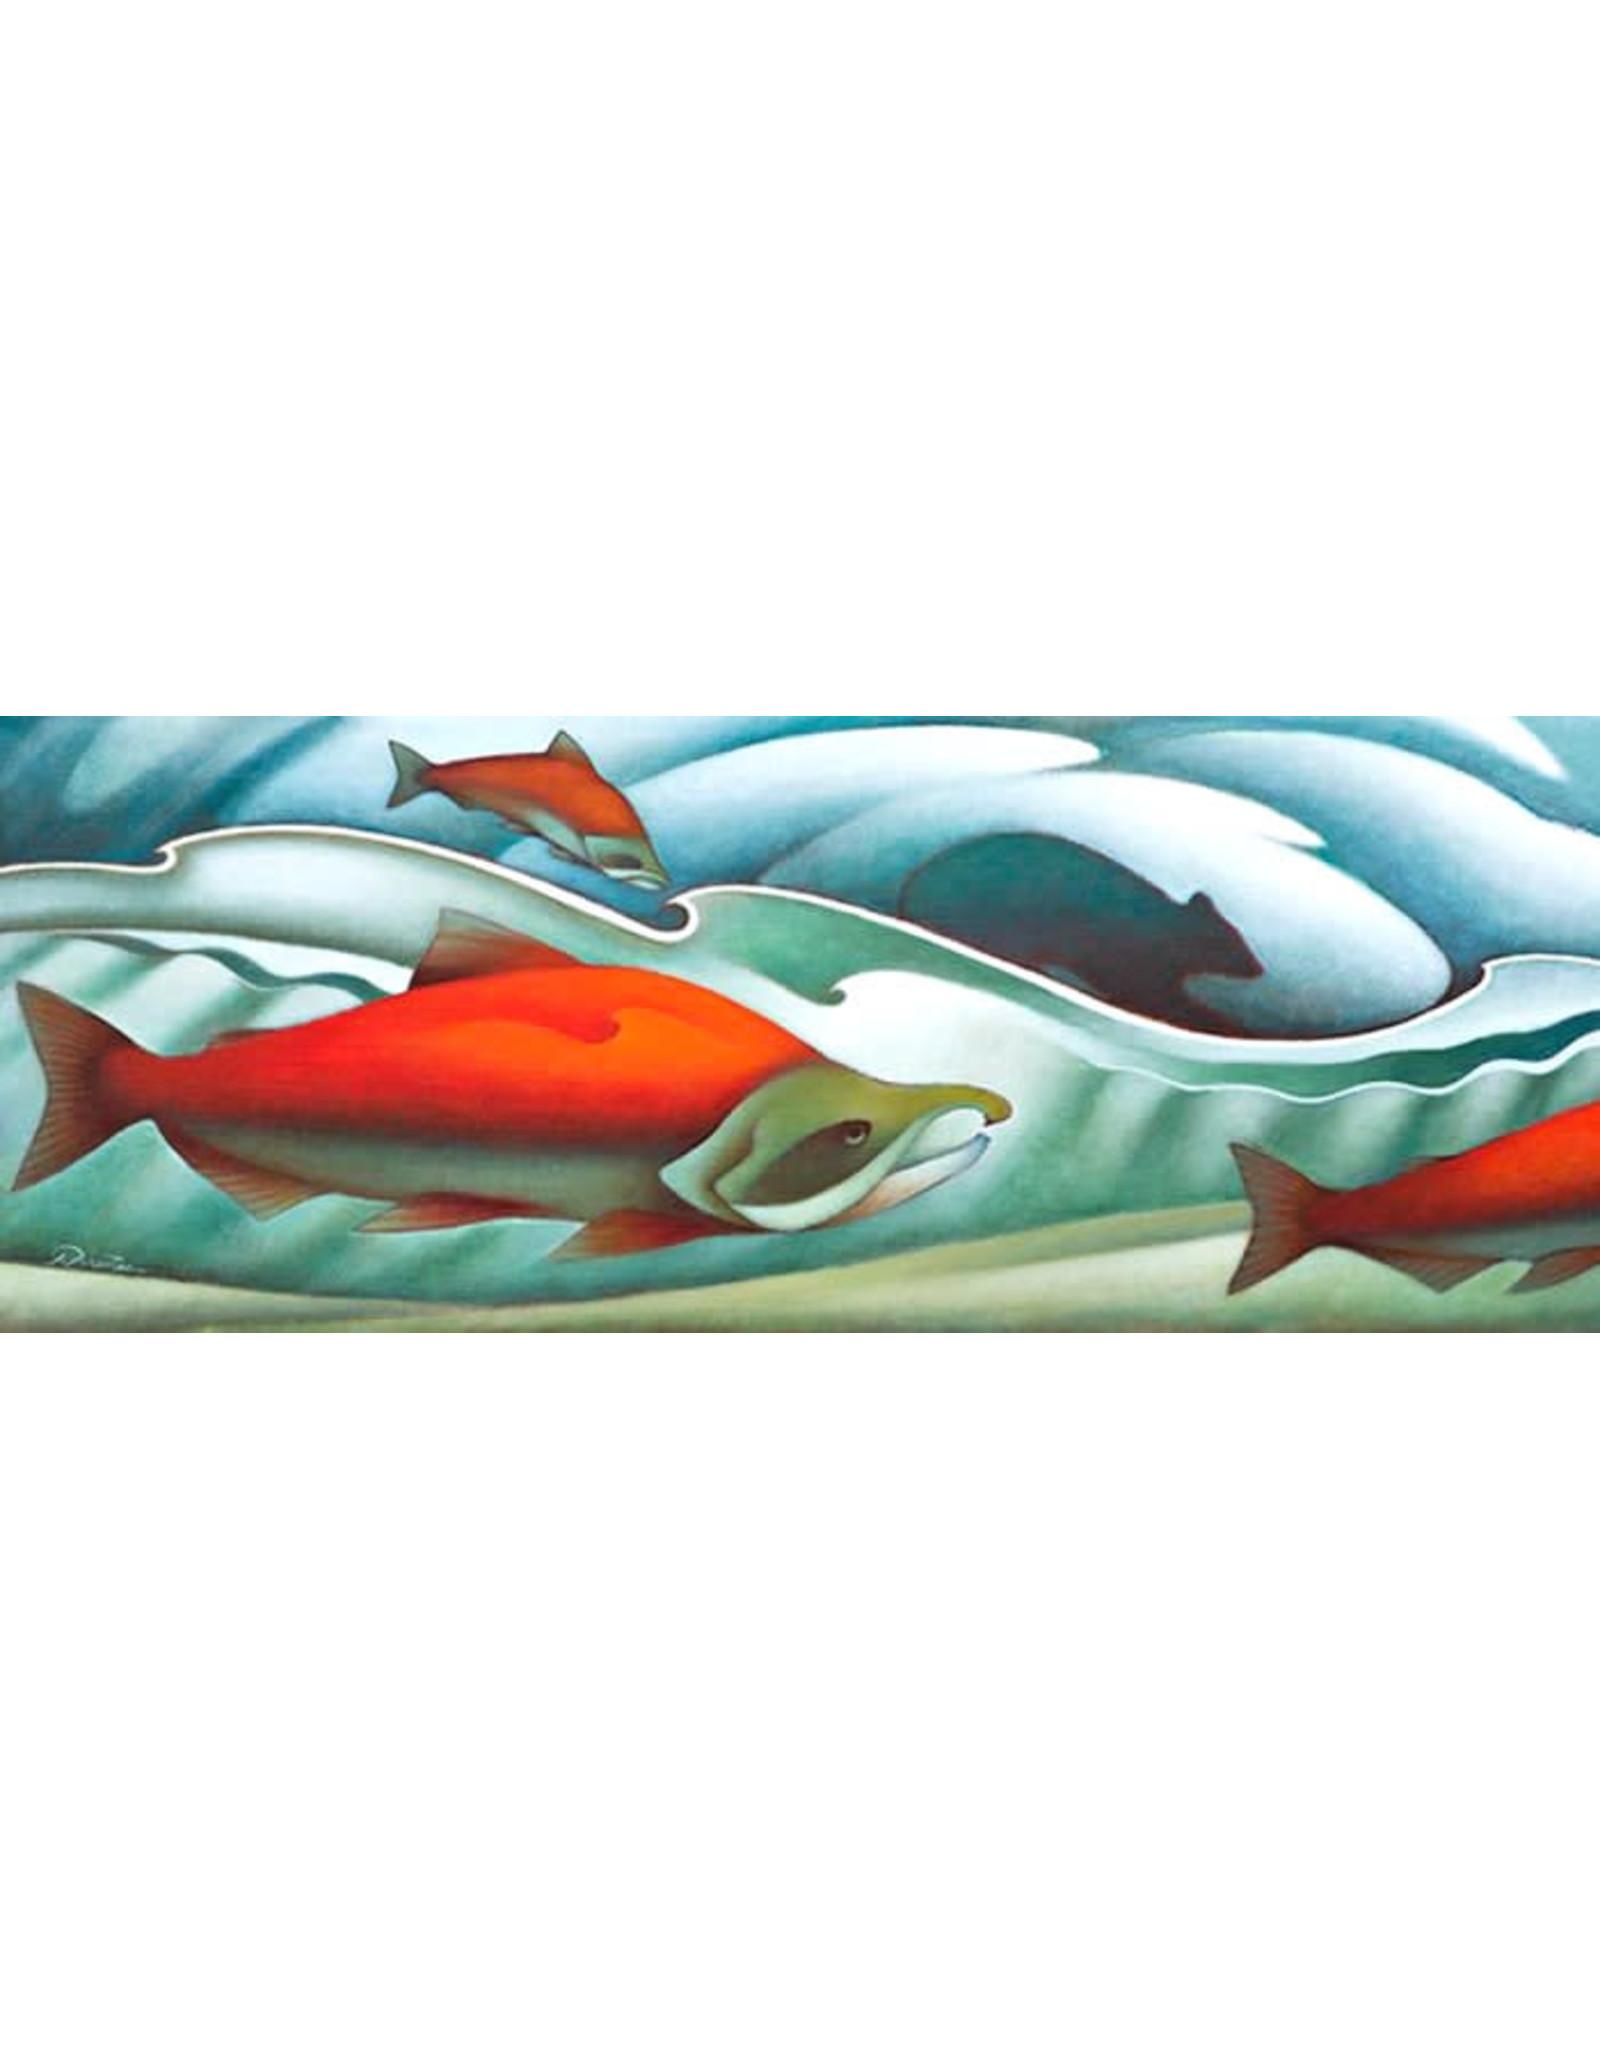 Nathalie Parenteau Song of the Salmon (art card) | Nathalie Parenteau